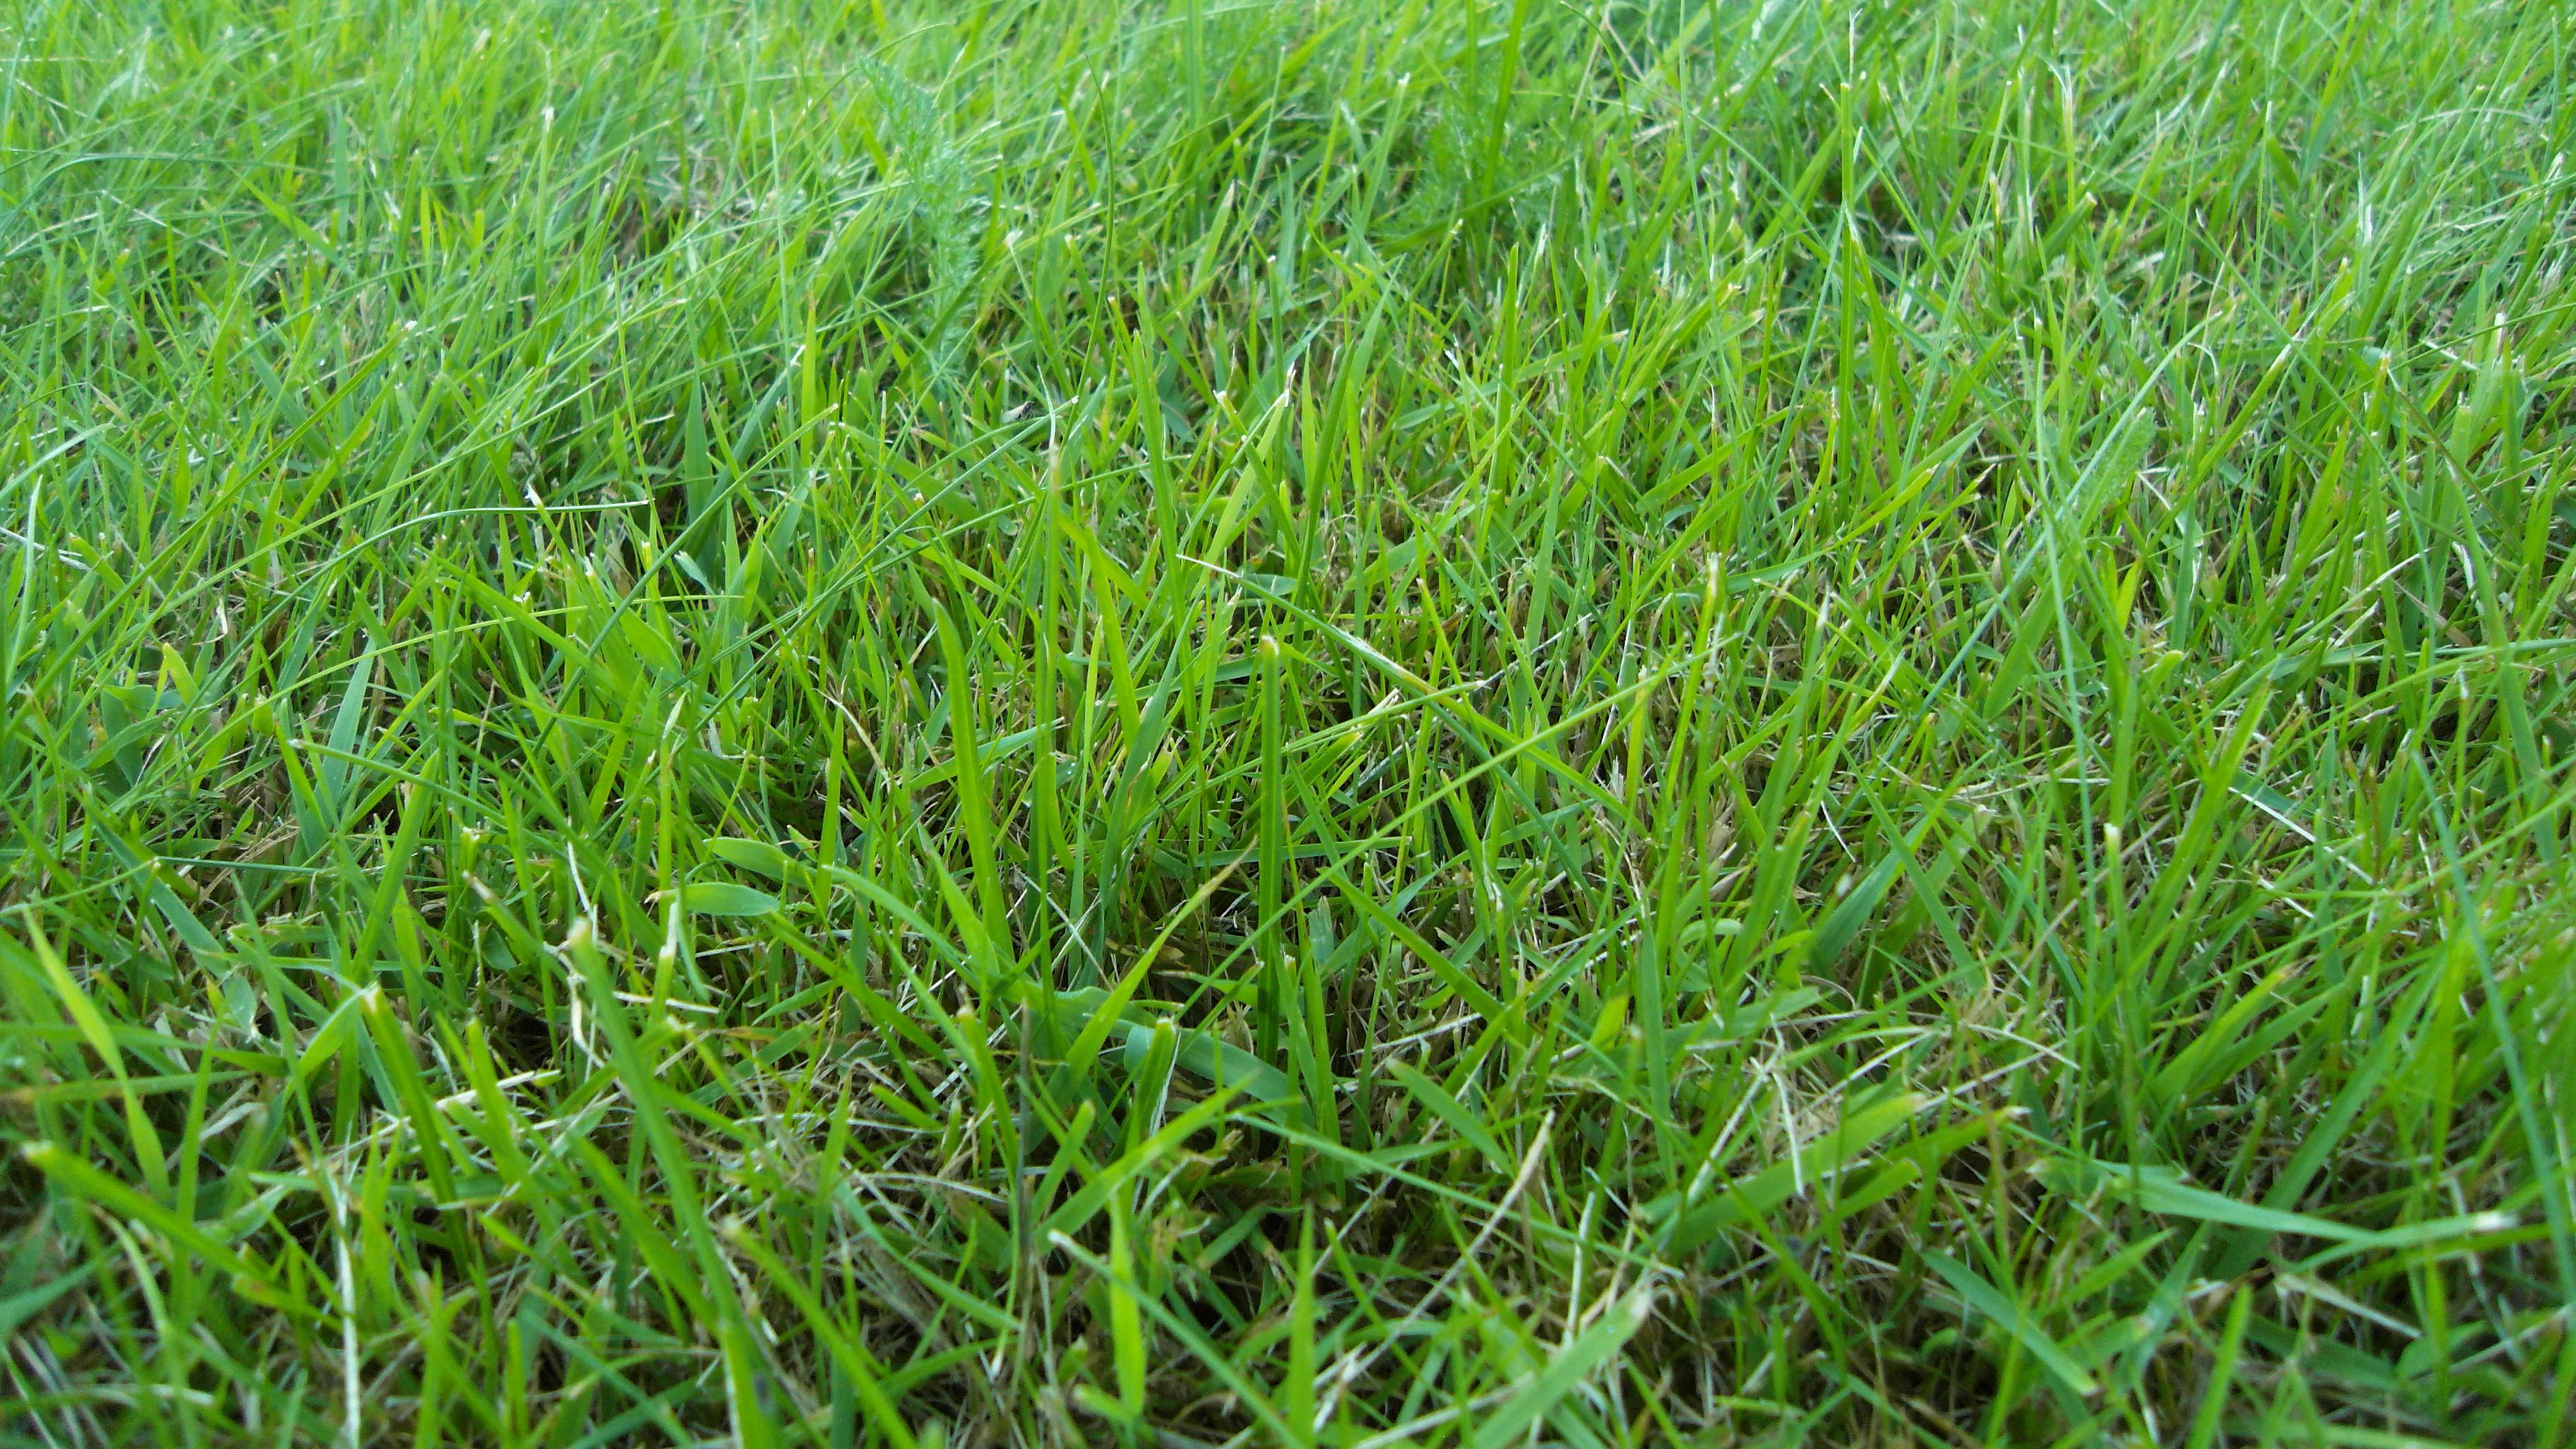 File:Green grass (cut).JPG - Wikimedia Commons